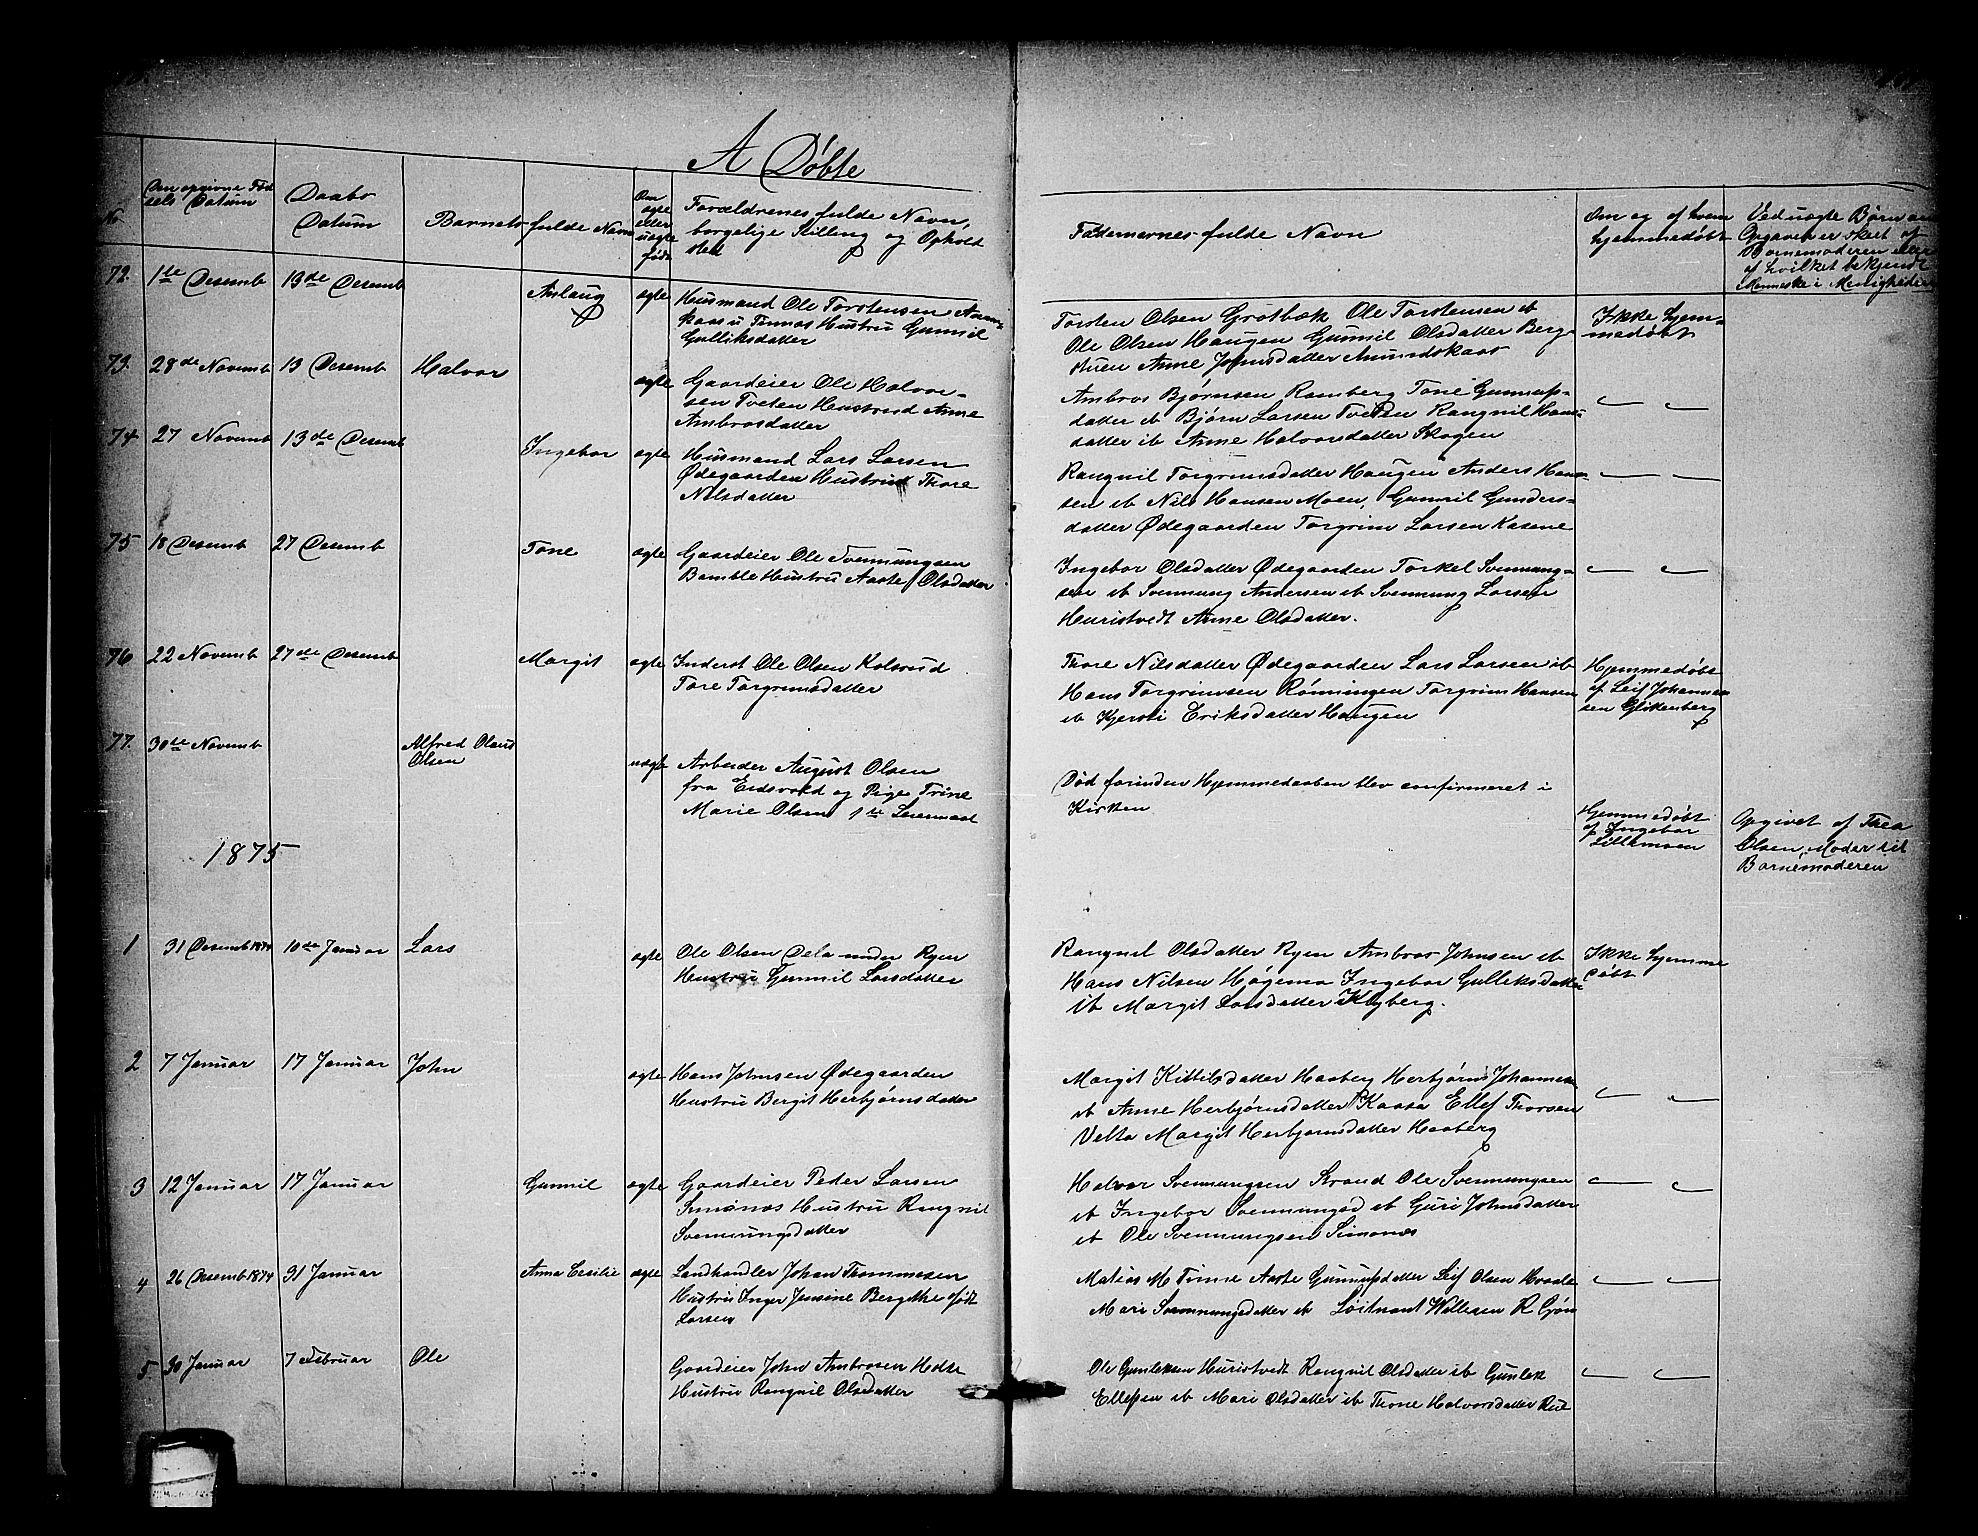 SAKO, Heddal kirkebøker, G/Ga/L0001: Klokkerbok nr. I 1, 1866-1878, s. 118-119